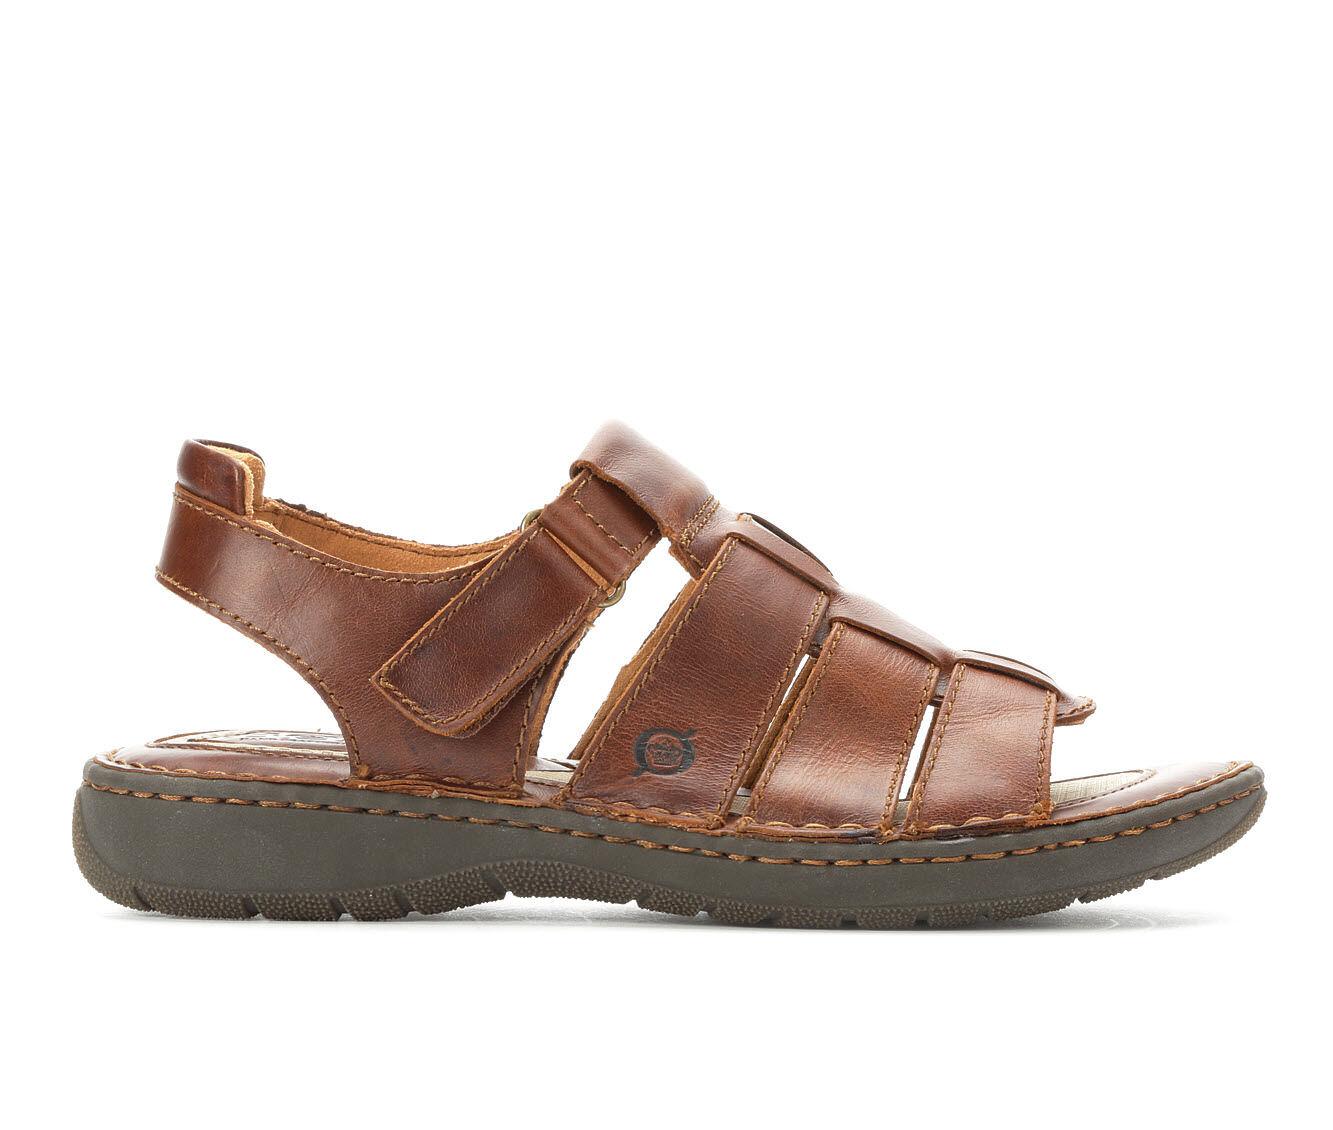 Men's Born Mark Fisherman Sandal Outdoor Sandals latest sale online original for sale 377KoLyU